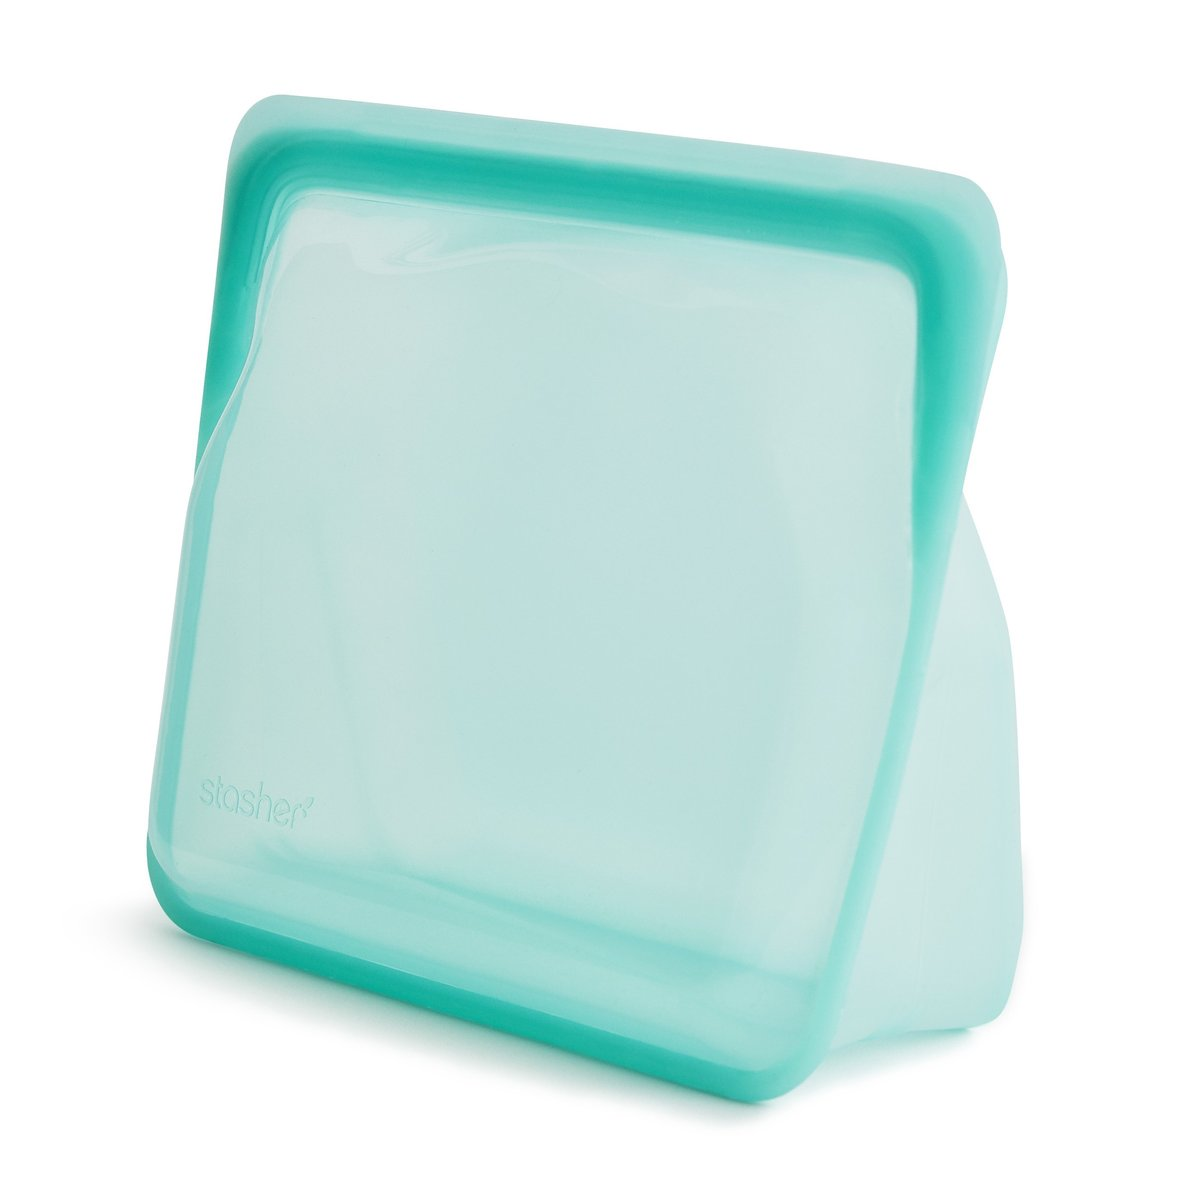 STASHER Stand Up Wielorazowa torebka silikonowa | SoBio Beauty Boutique